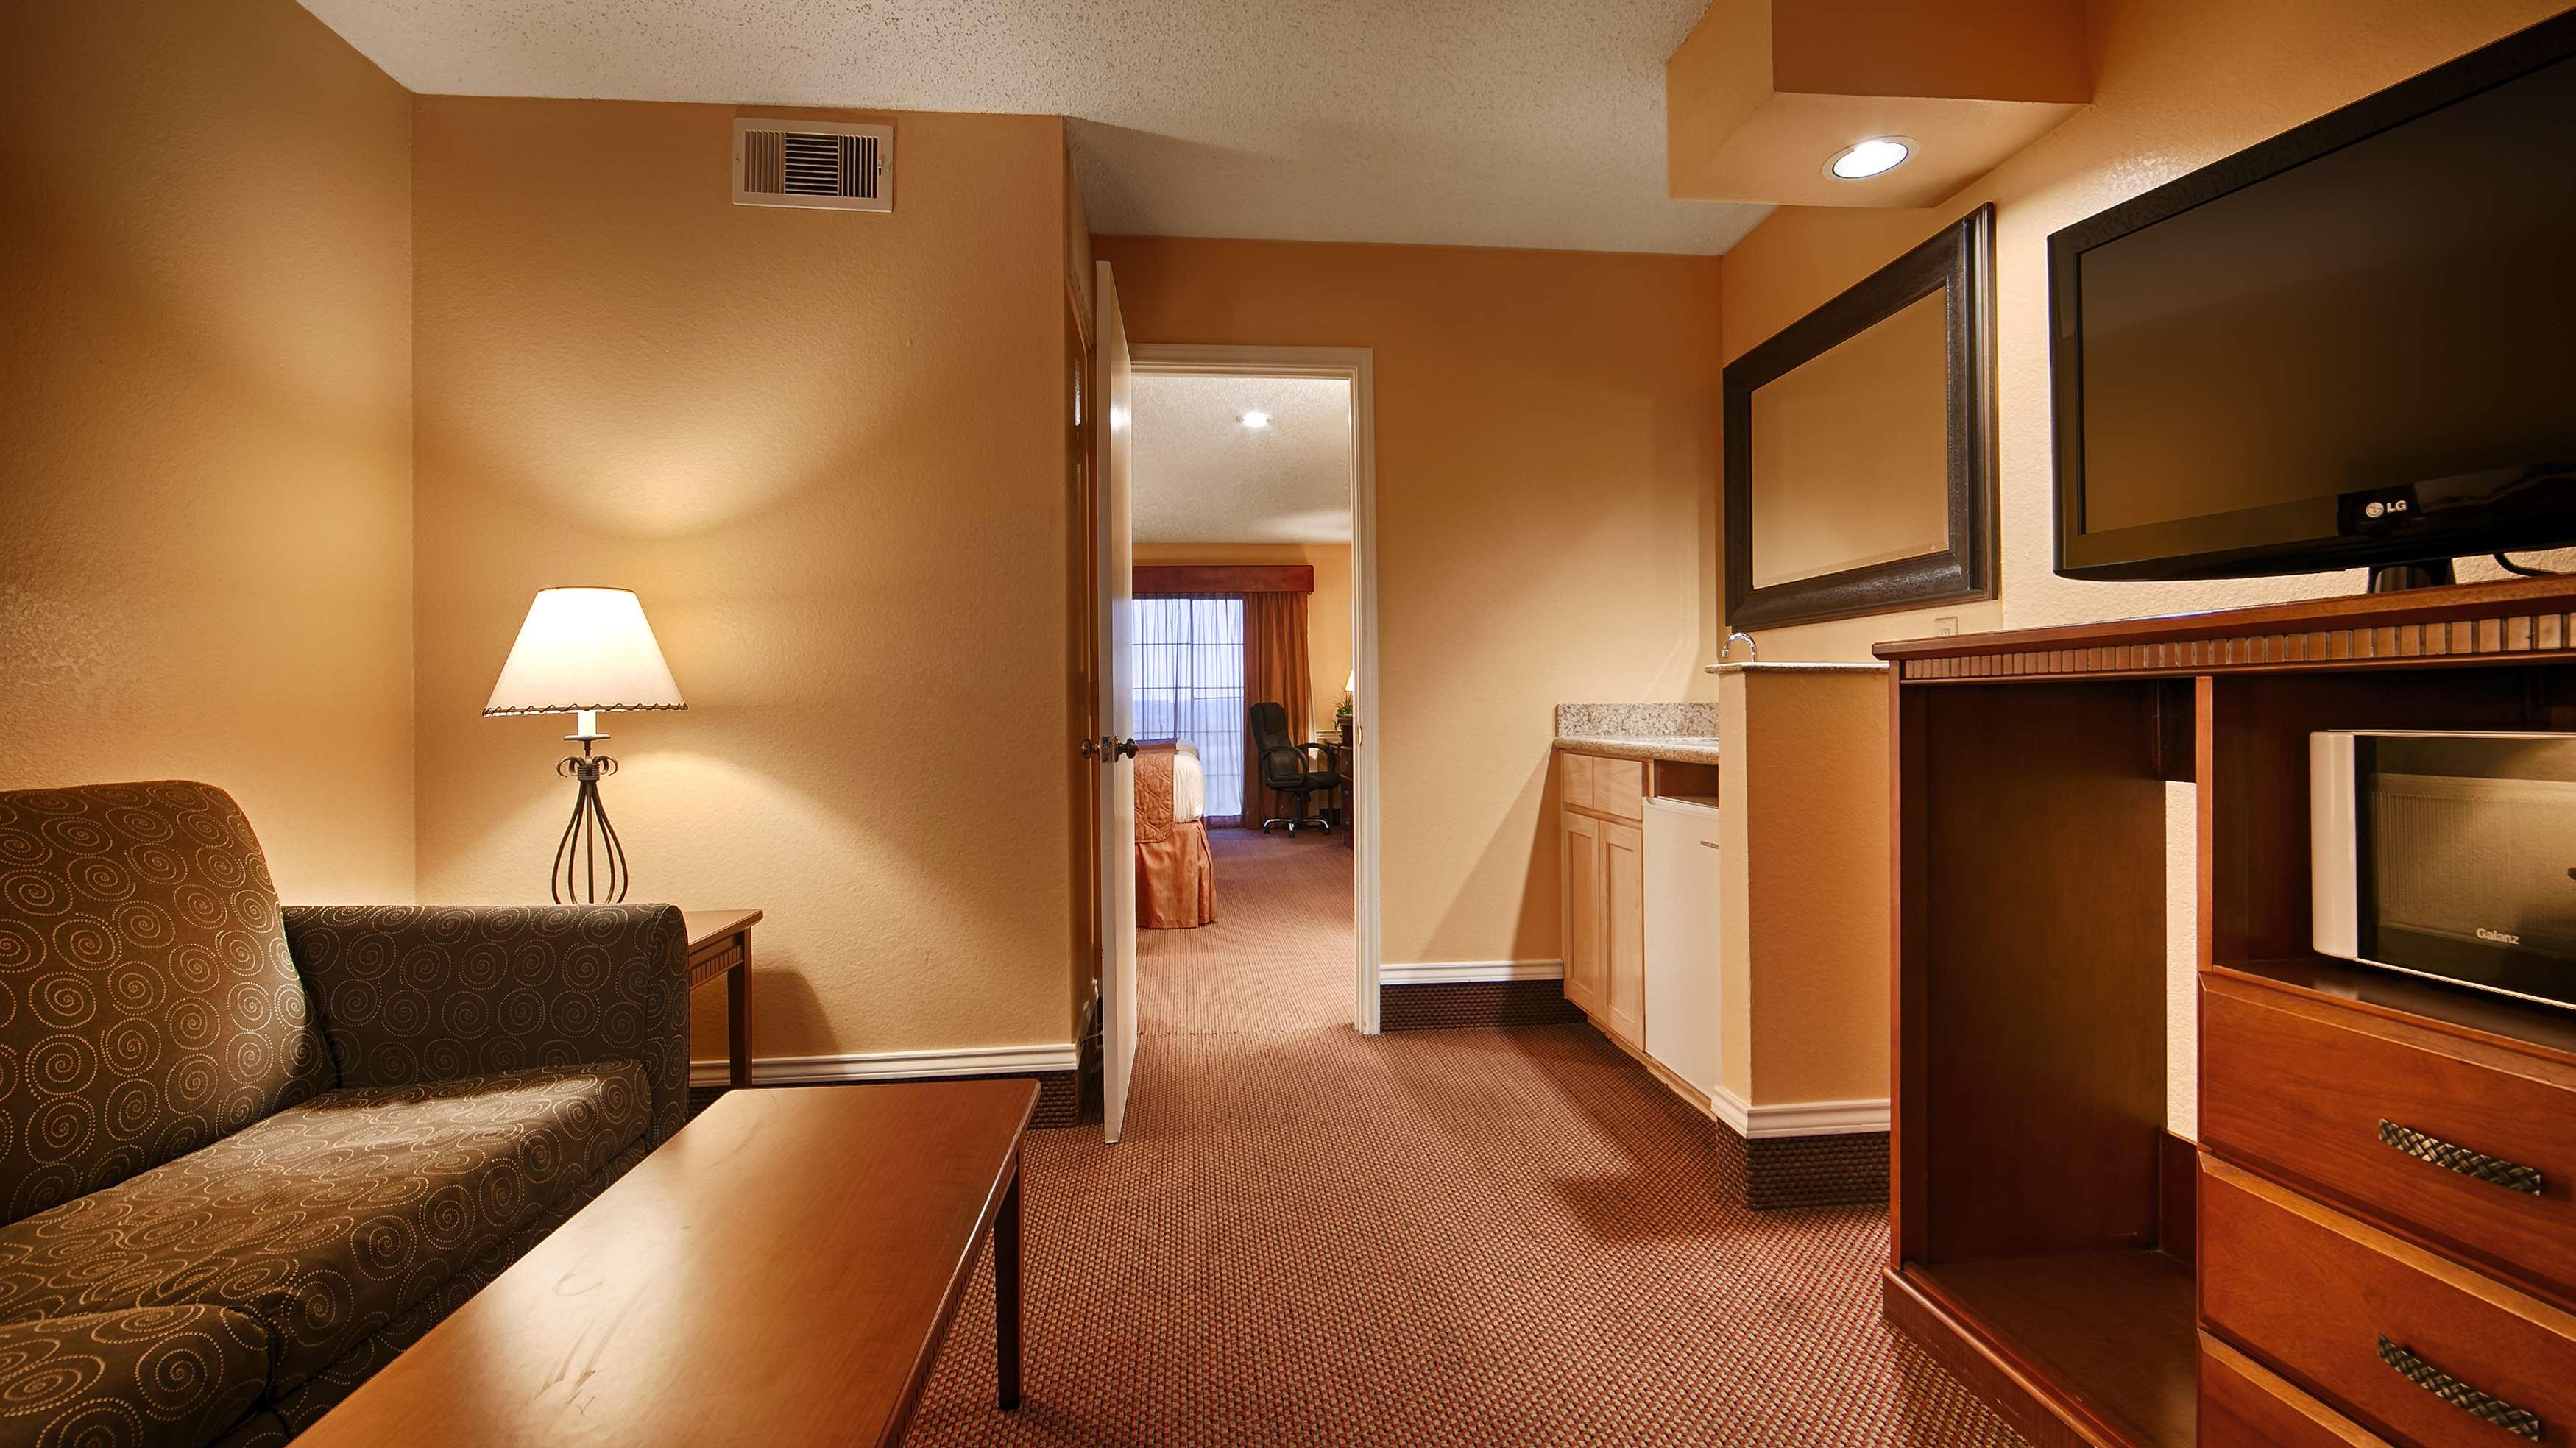 Best Western Trail Dust Inn & Suites image 23